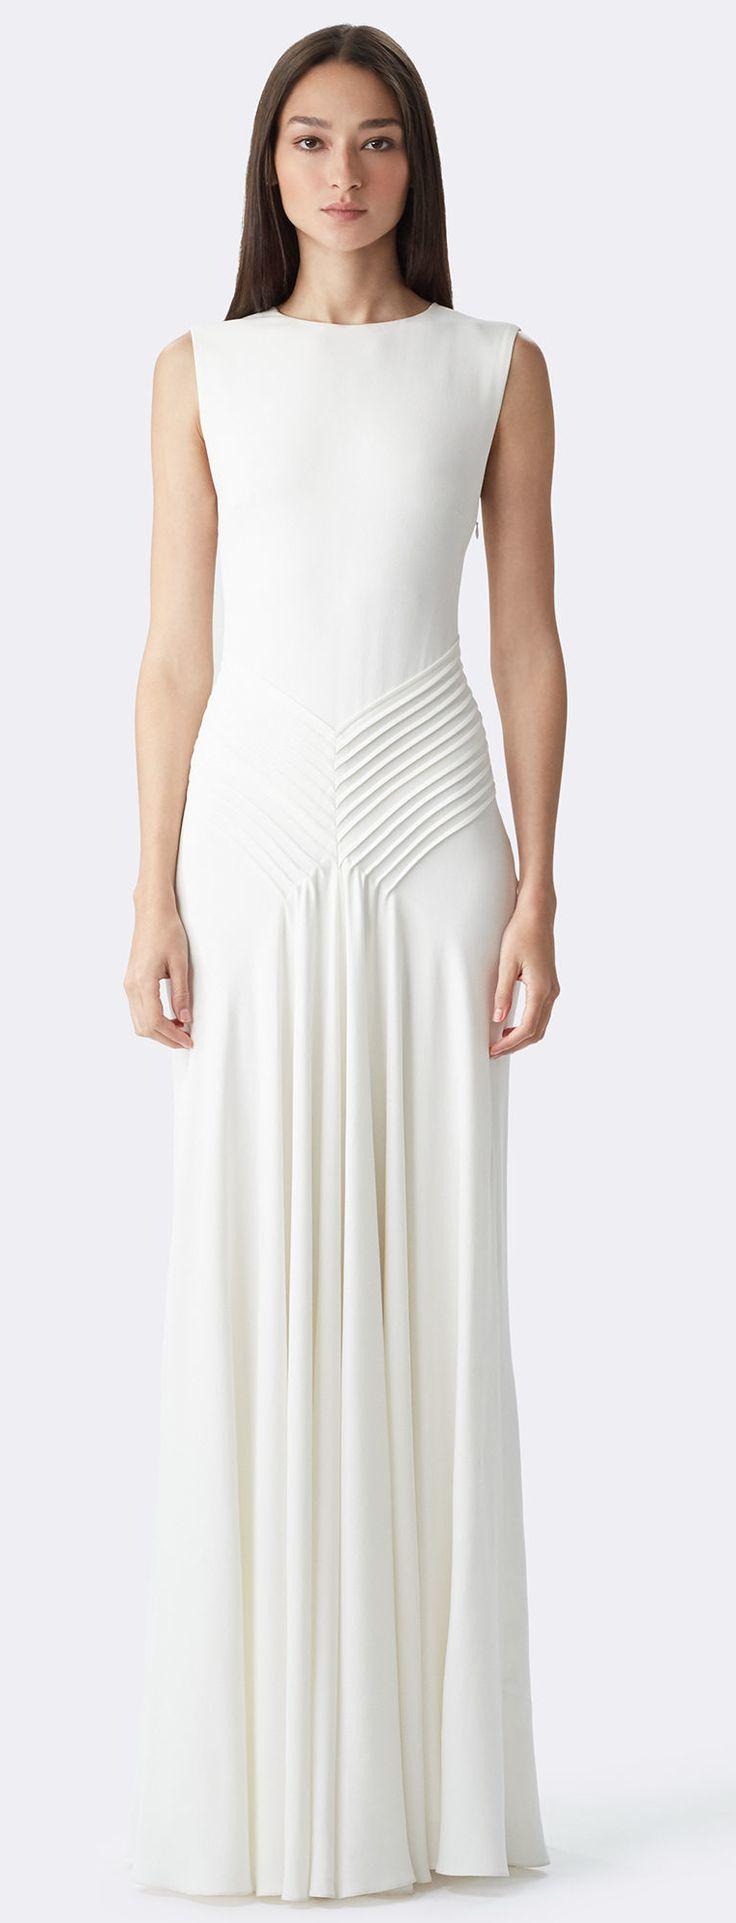 21 best Kleider images on Pinterest | Curve dresses, Clothing and ...